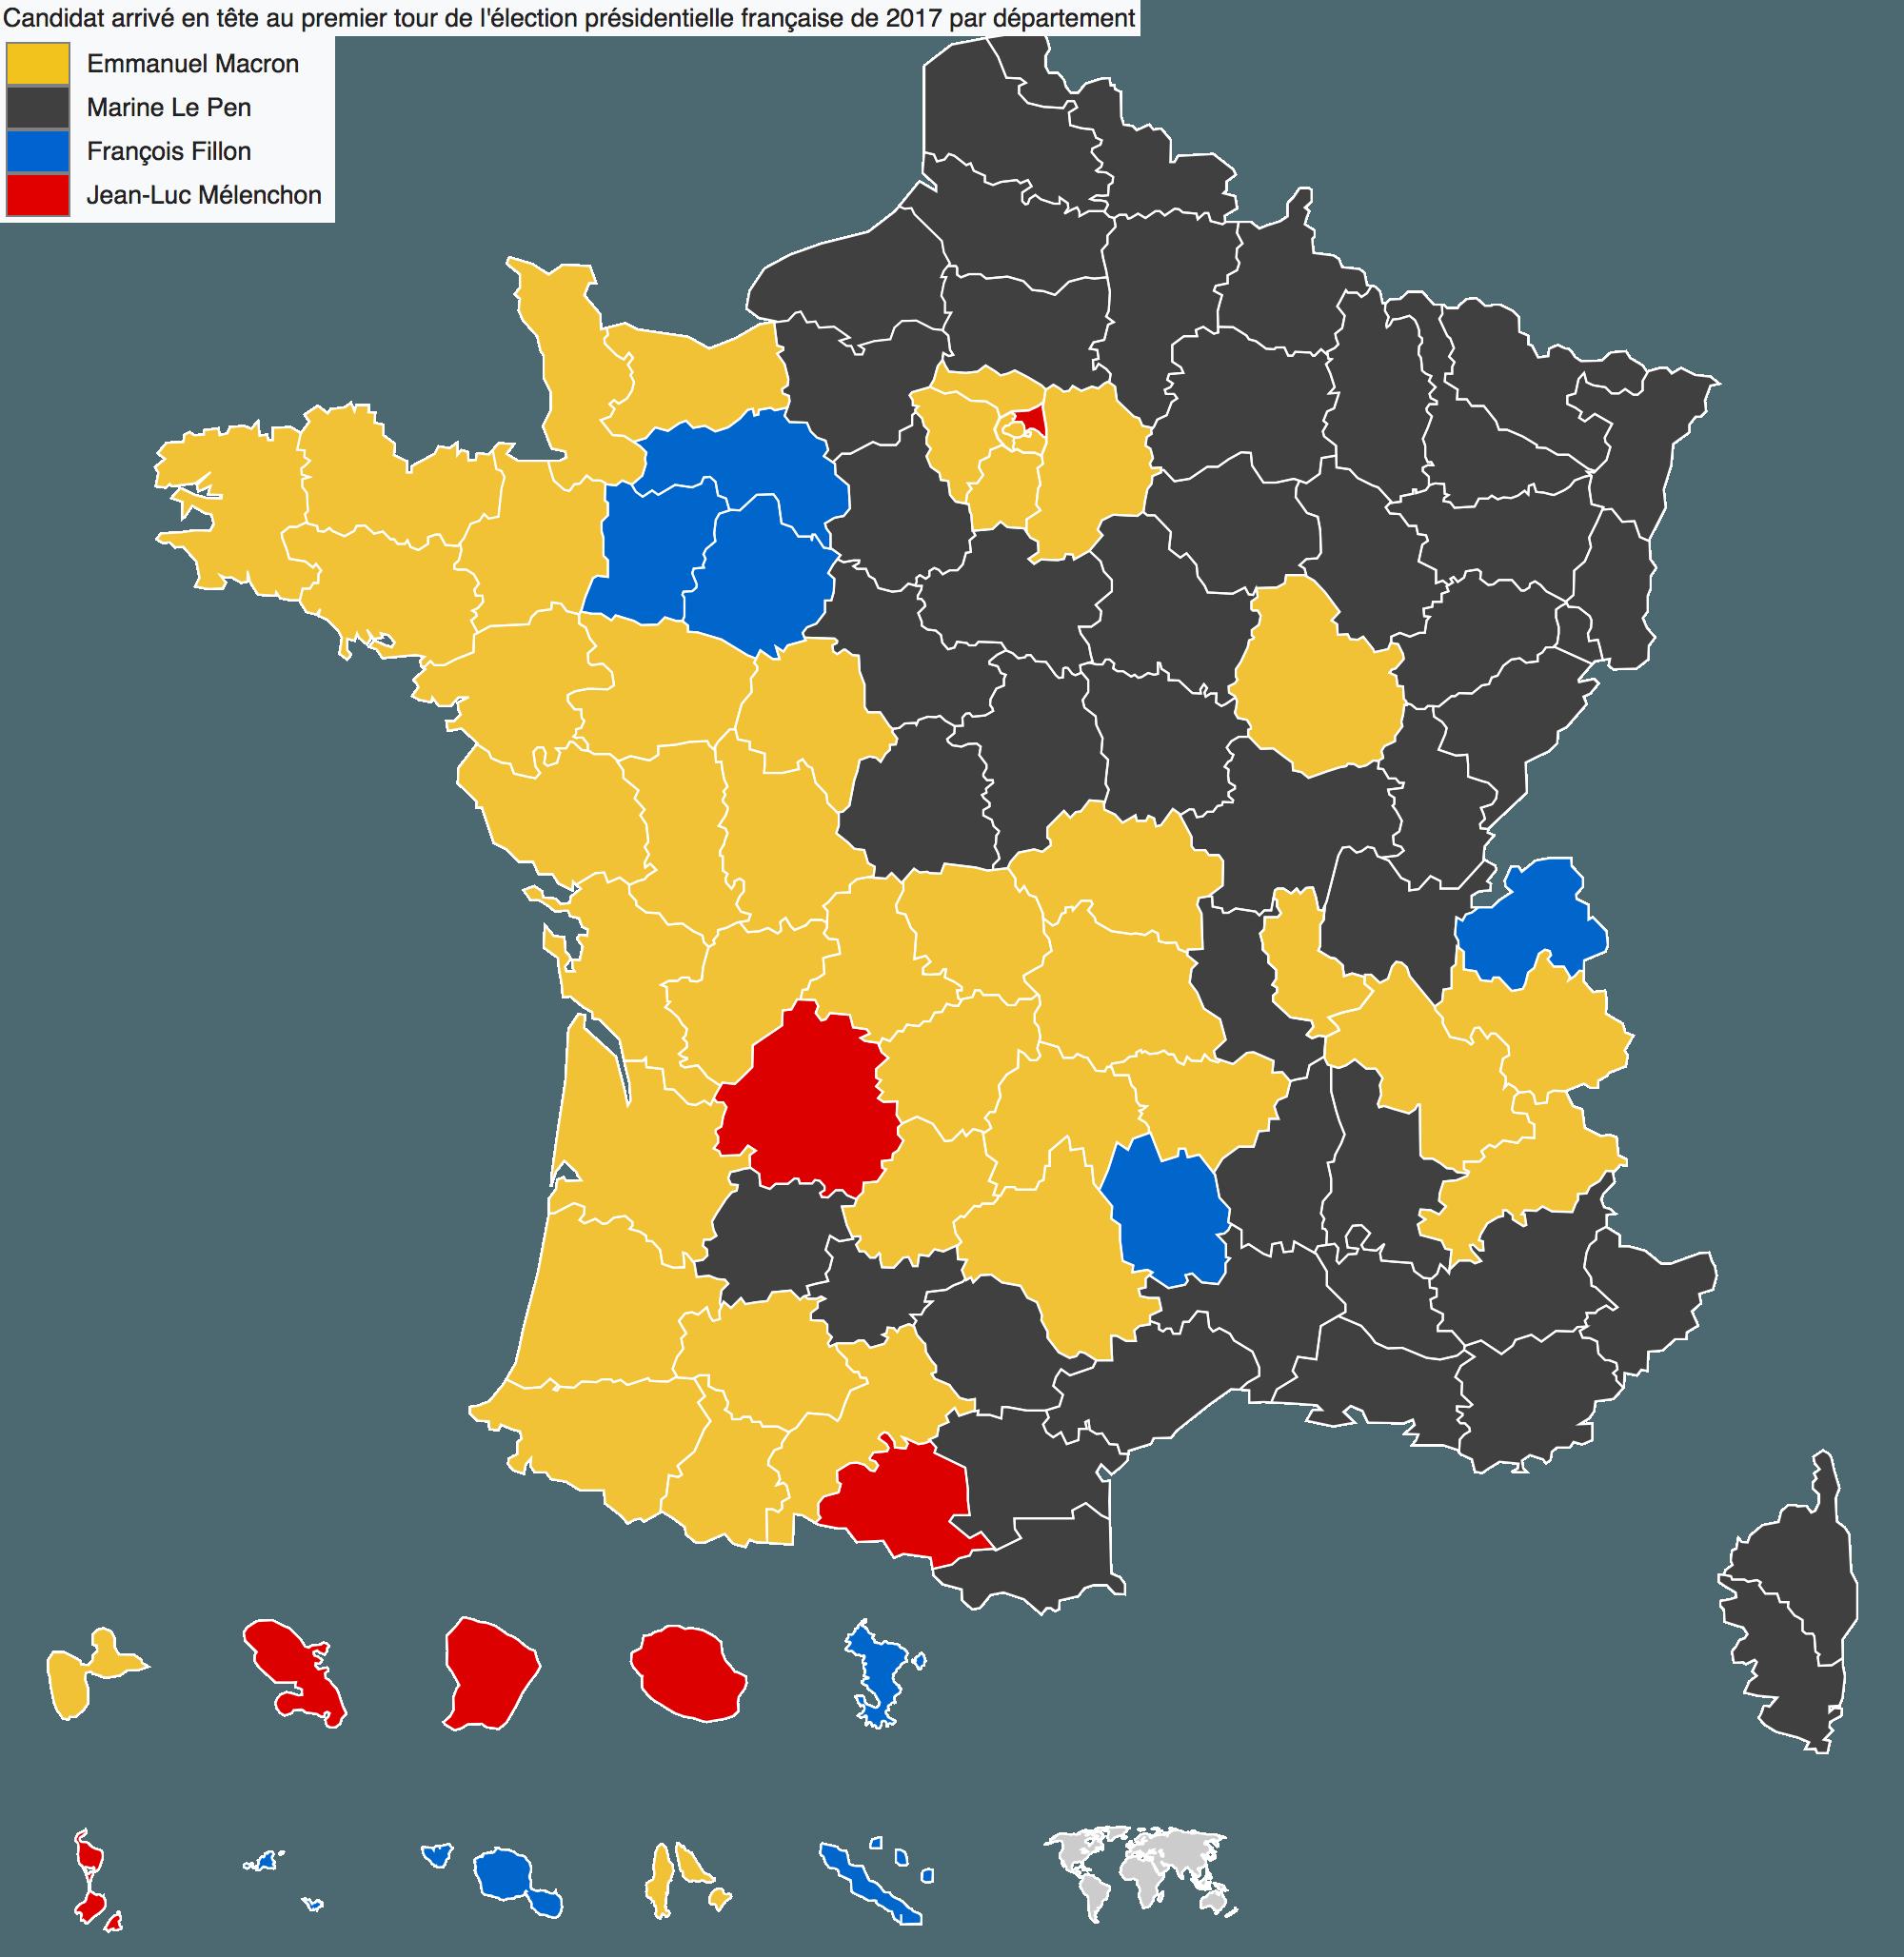 France-elections-presidentielles-2017-resultats-1er-tour